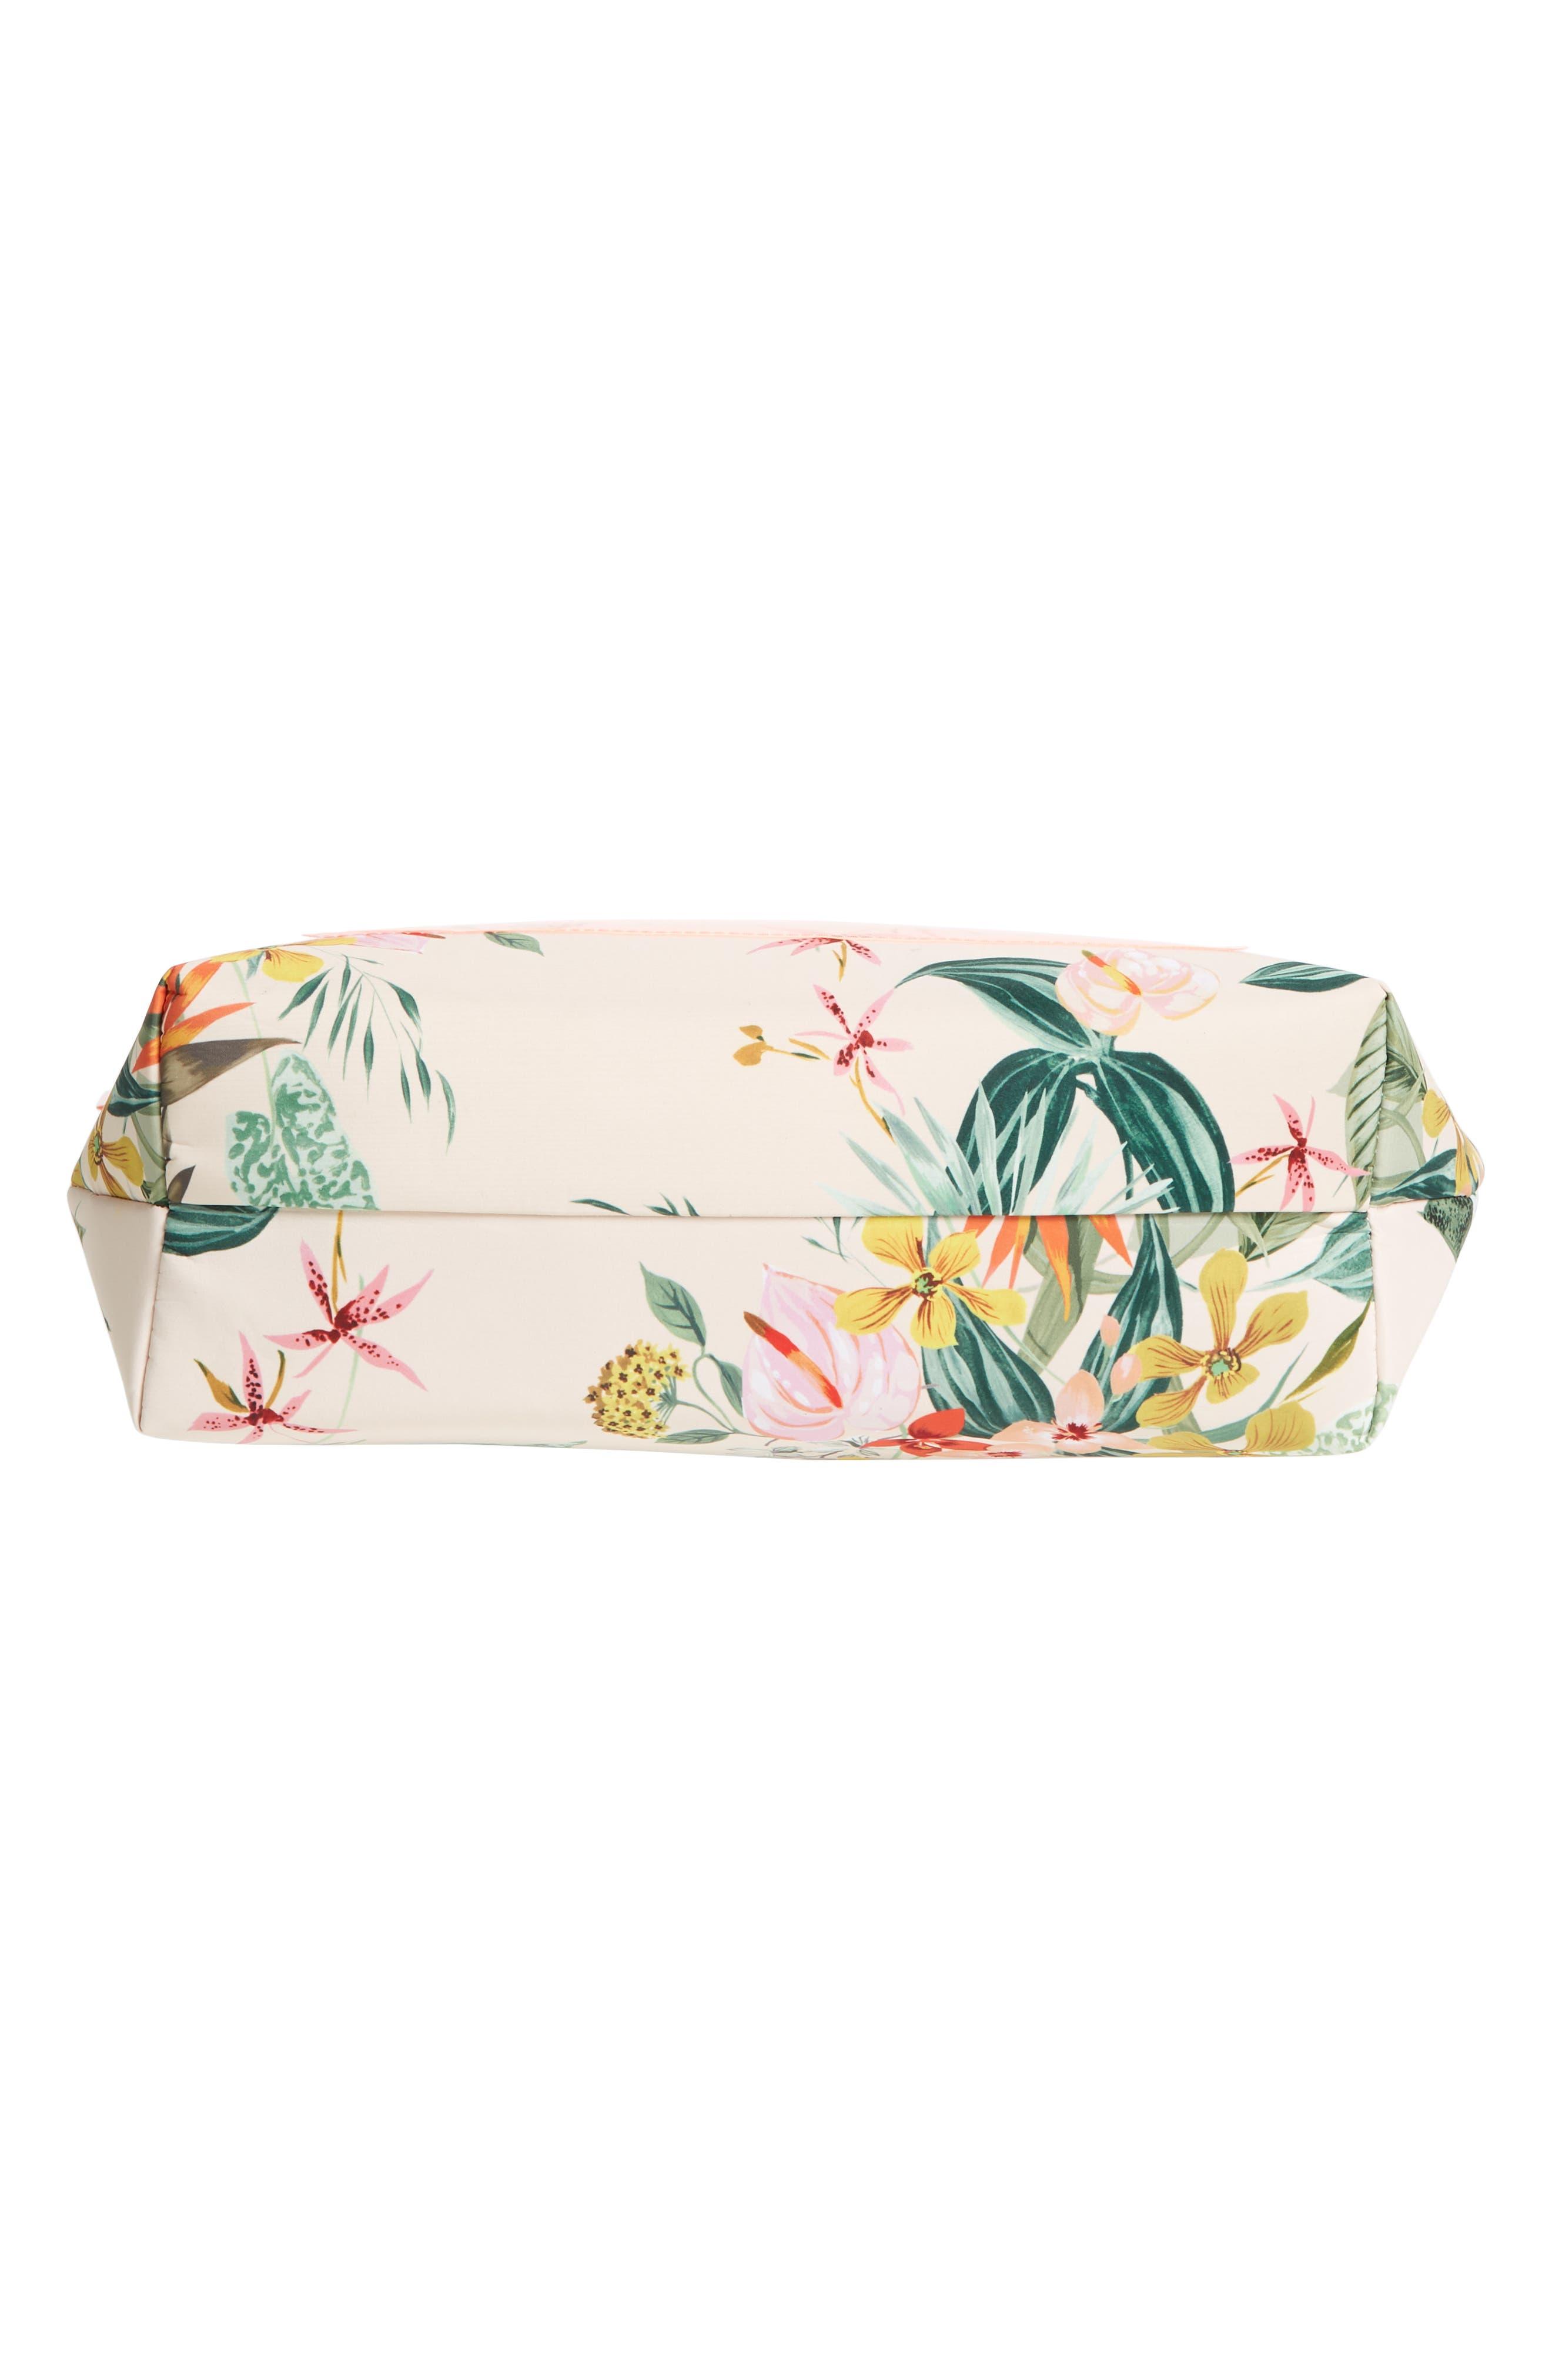 Paradiso Cooler Bag,                             Alternate thumbnail 5, color,                             Cream